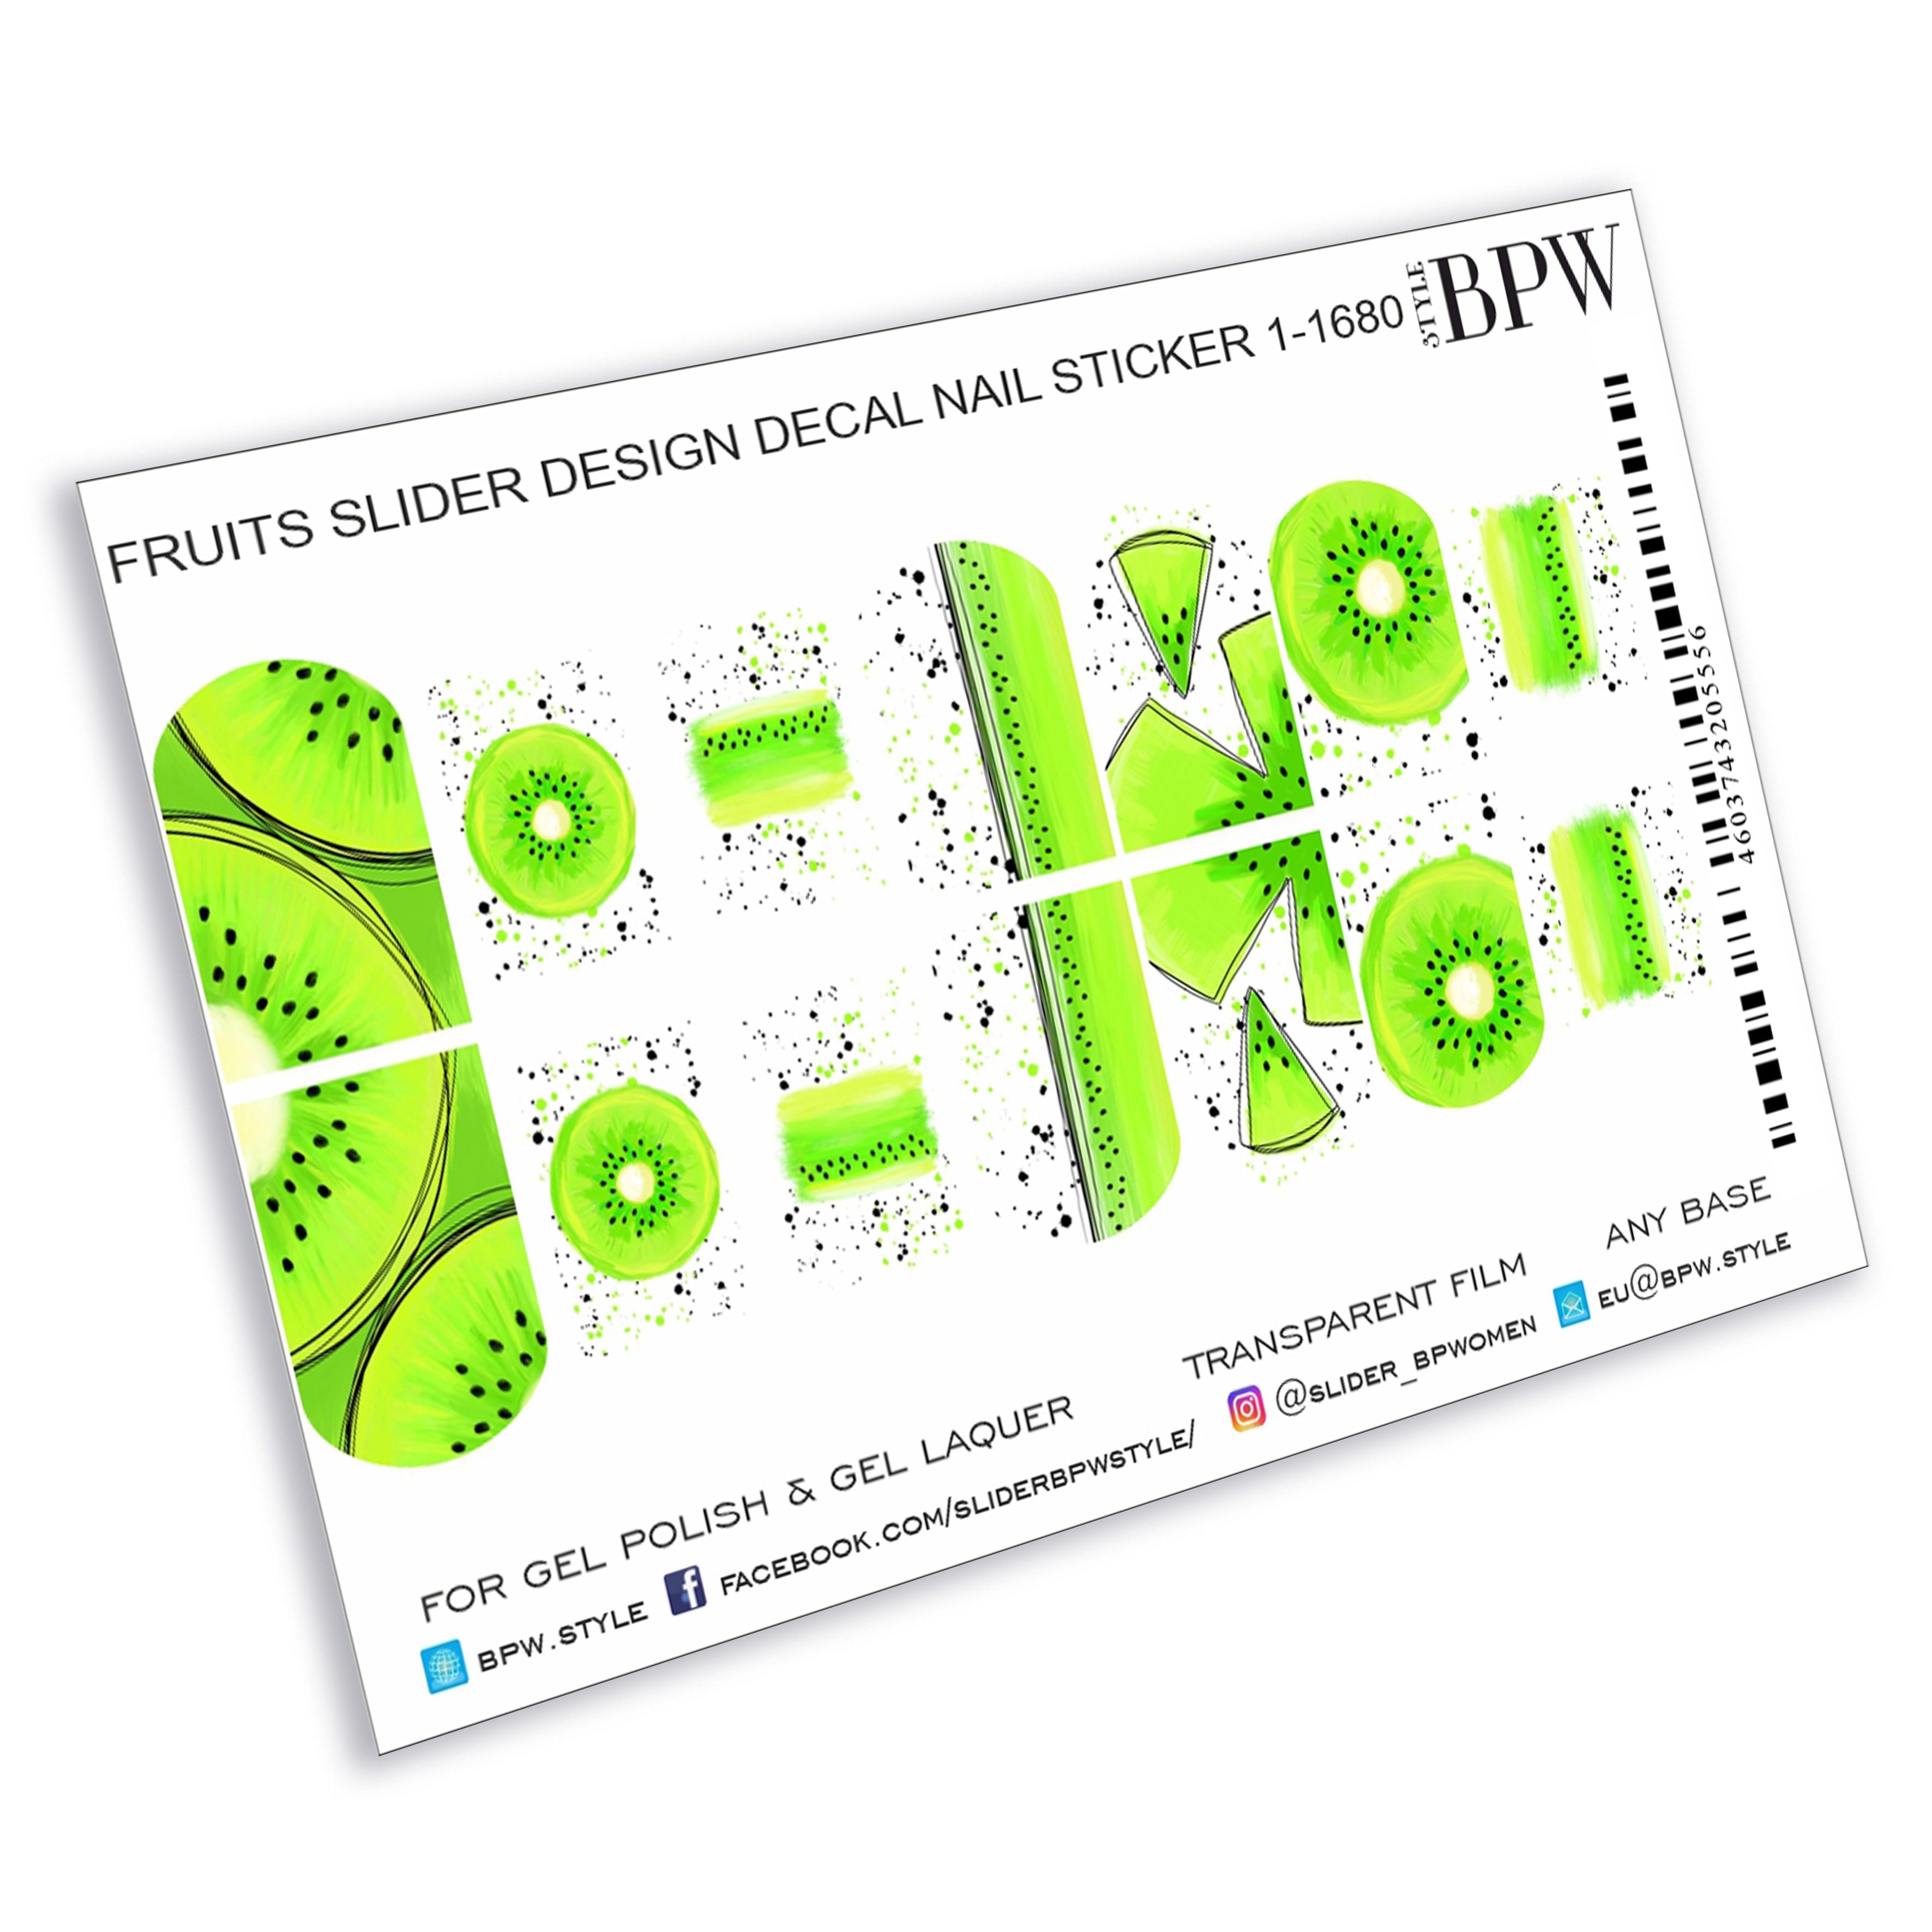 Kaymak tasarım kokteyl Kivi, BPW. Stil, su tırnak sticker, sd1-1680